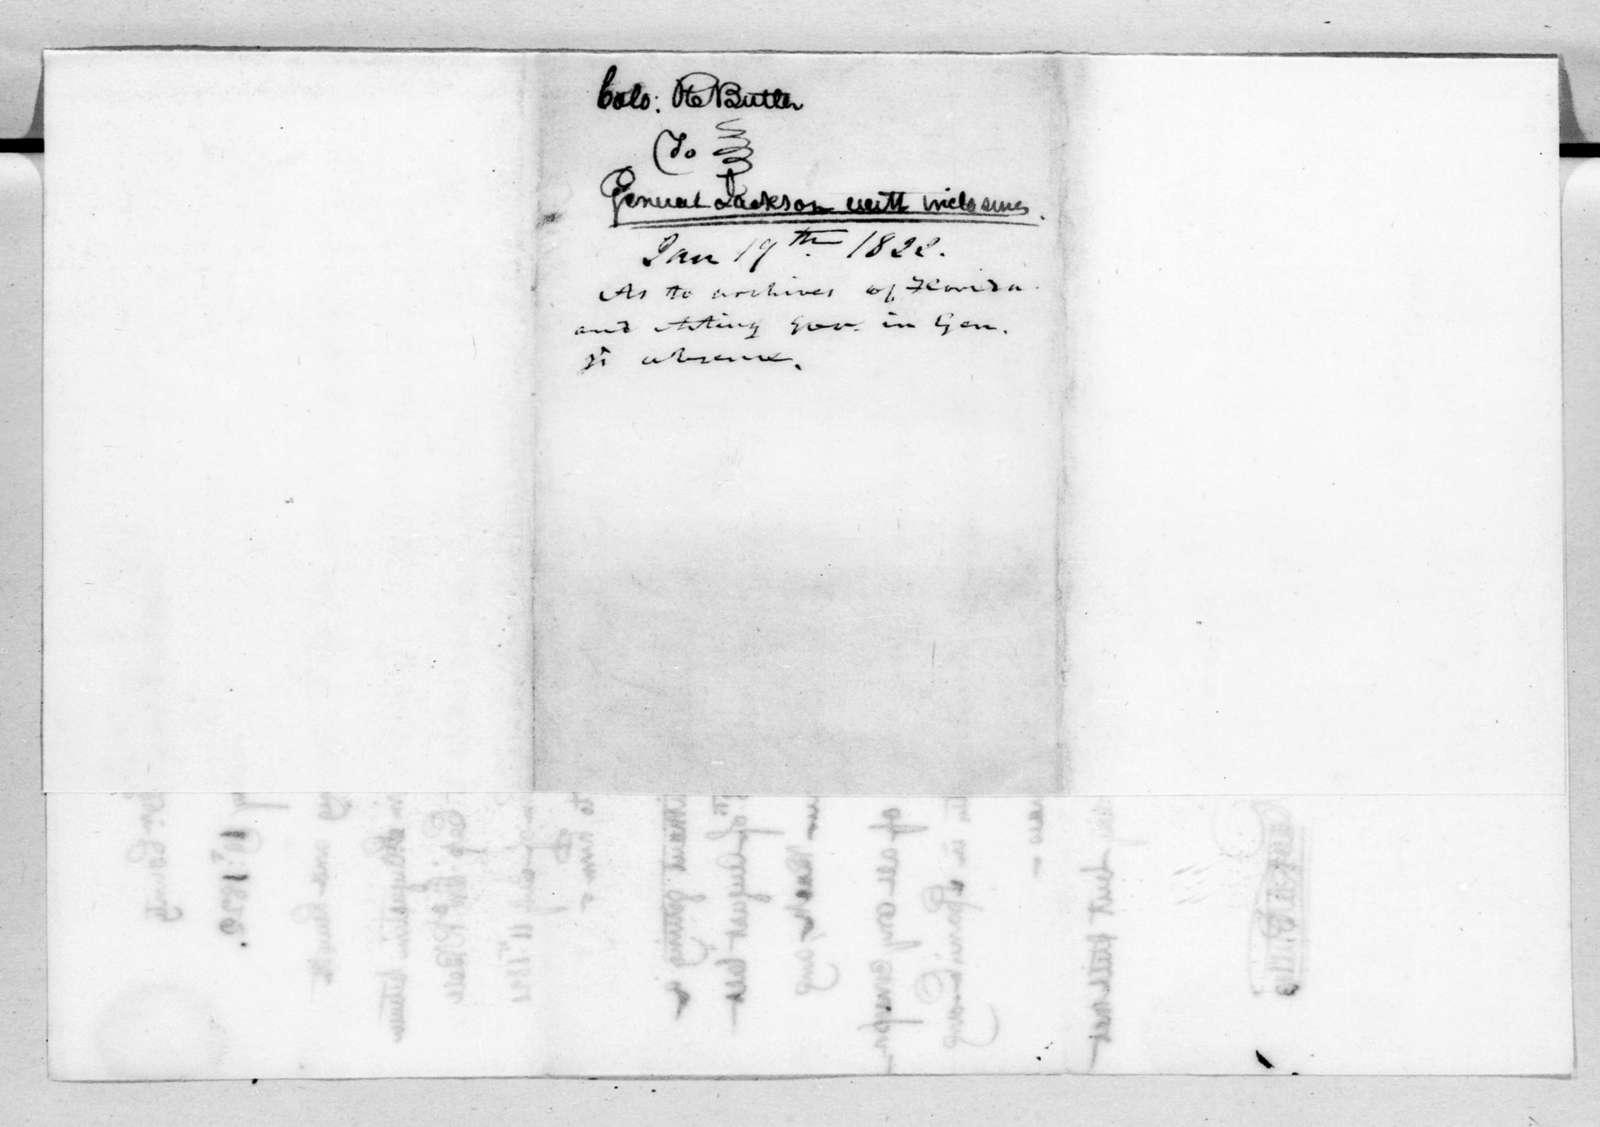 Robert Butler to Andrew Jackson, January 19, 1822